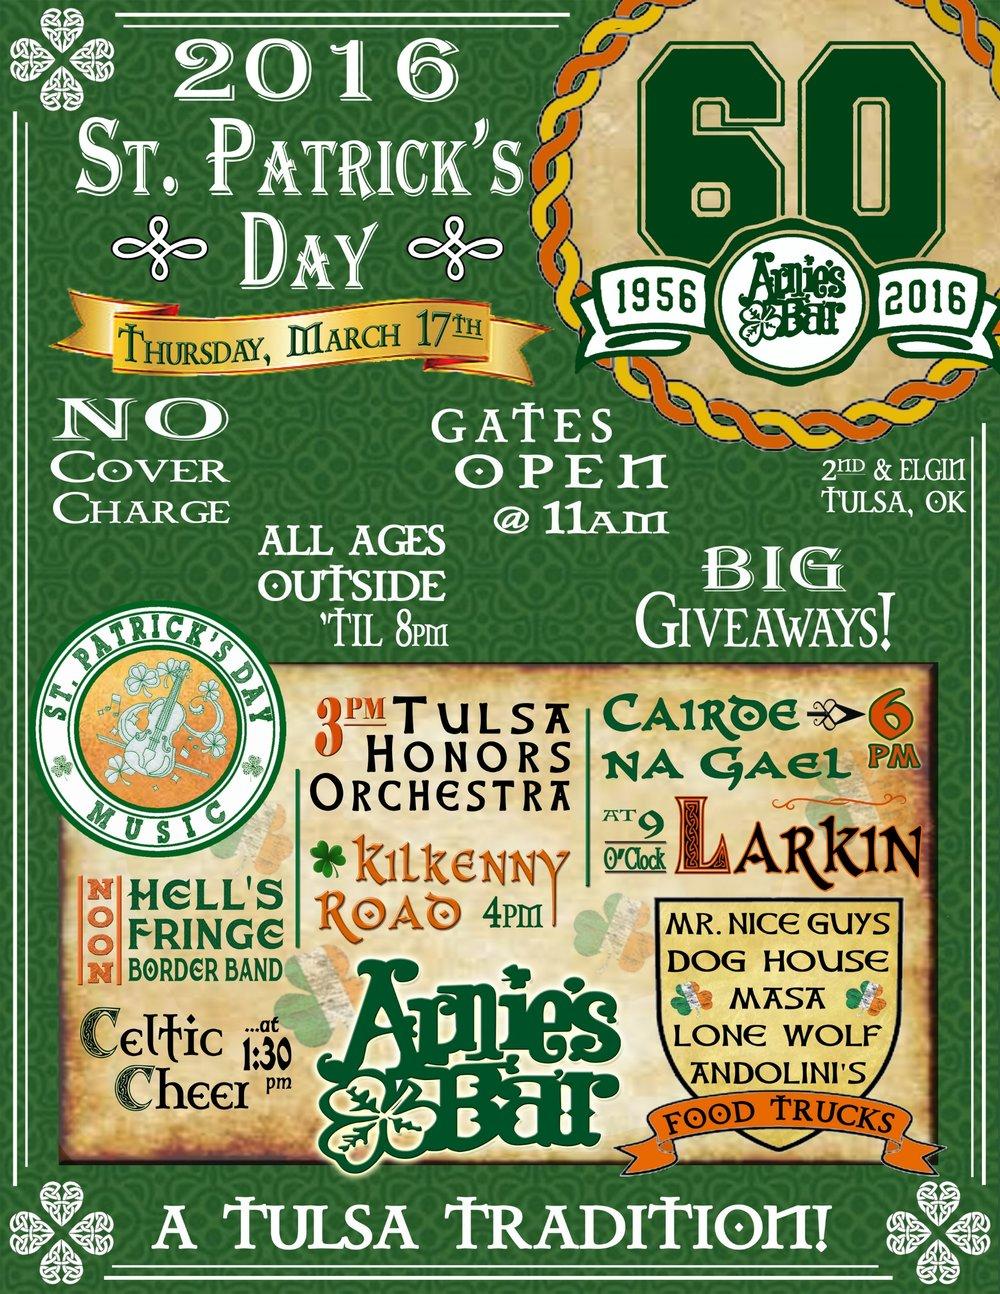 2016 St Patrick's Day Poster.jpg